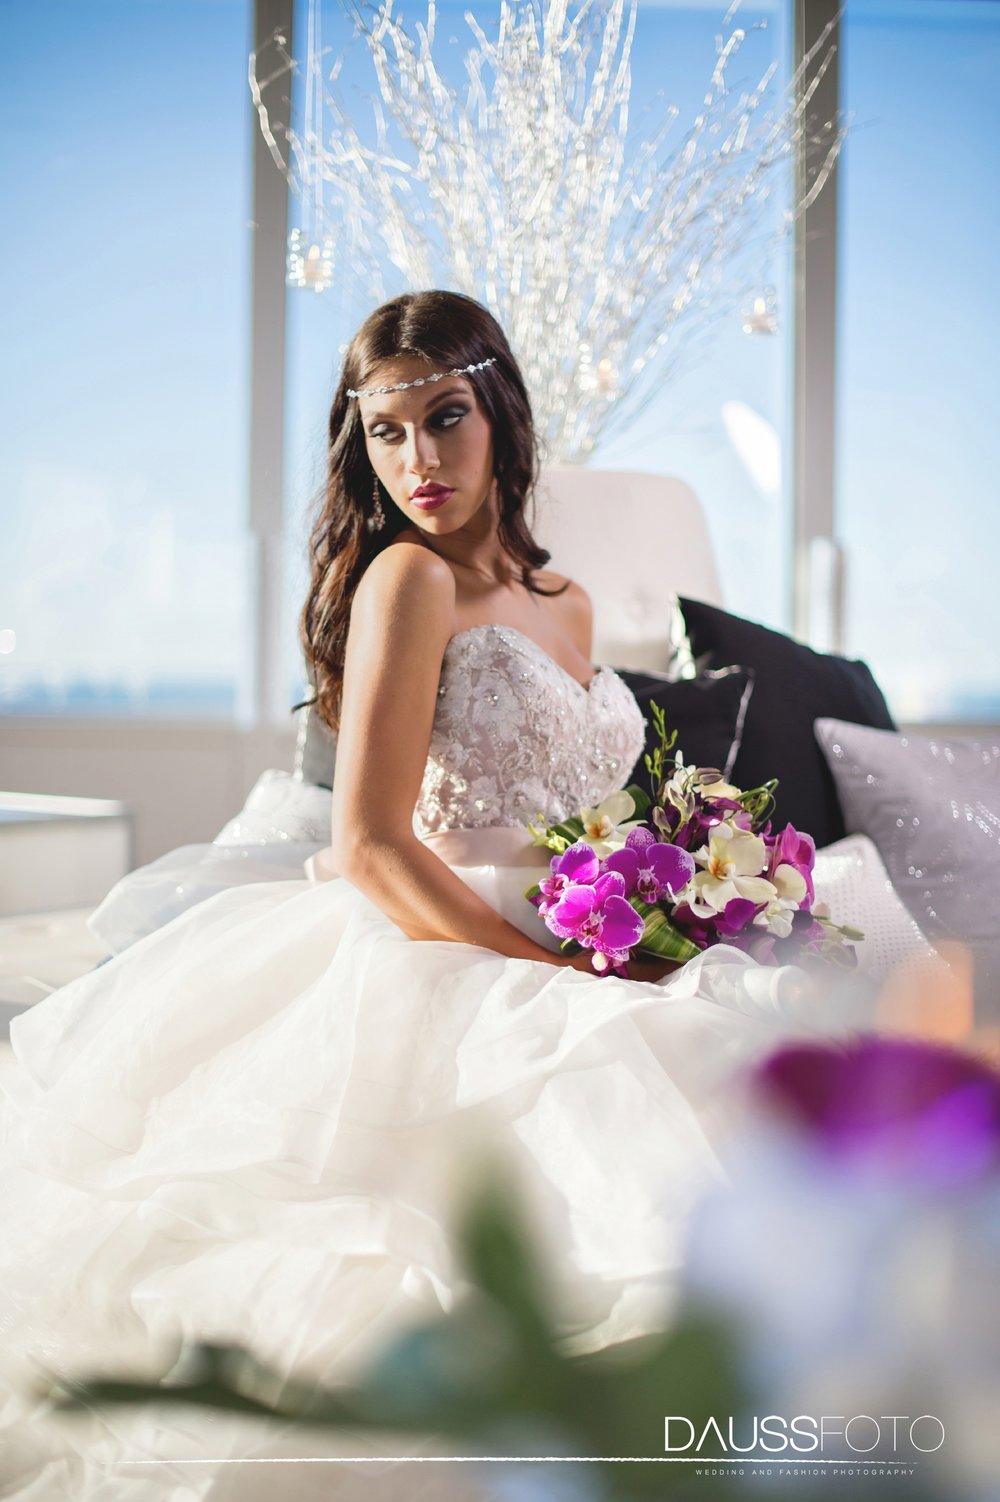 DaussFOTO_20150721_100_Indiana Wedding Photographer.jpg